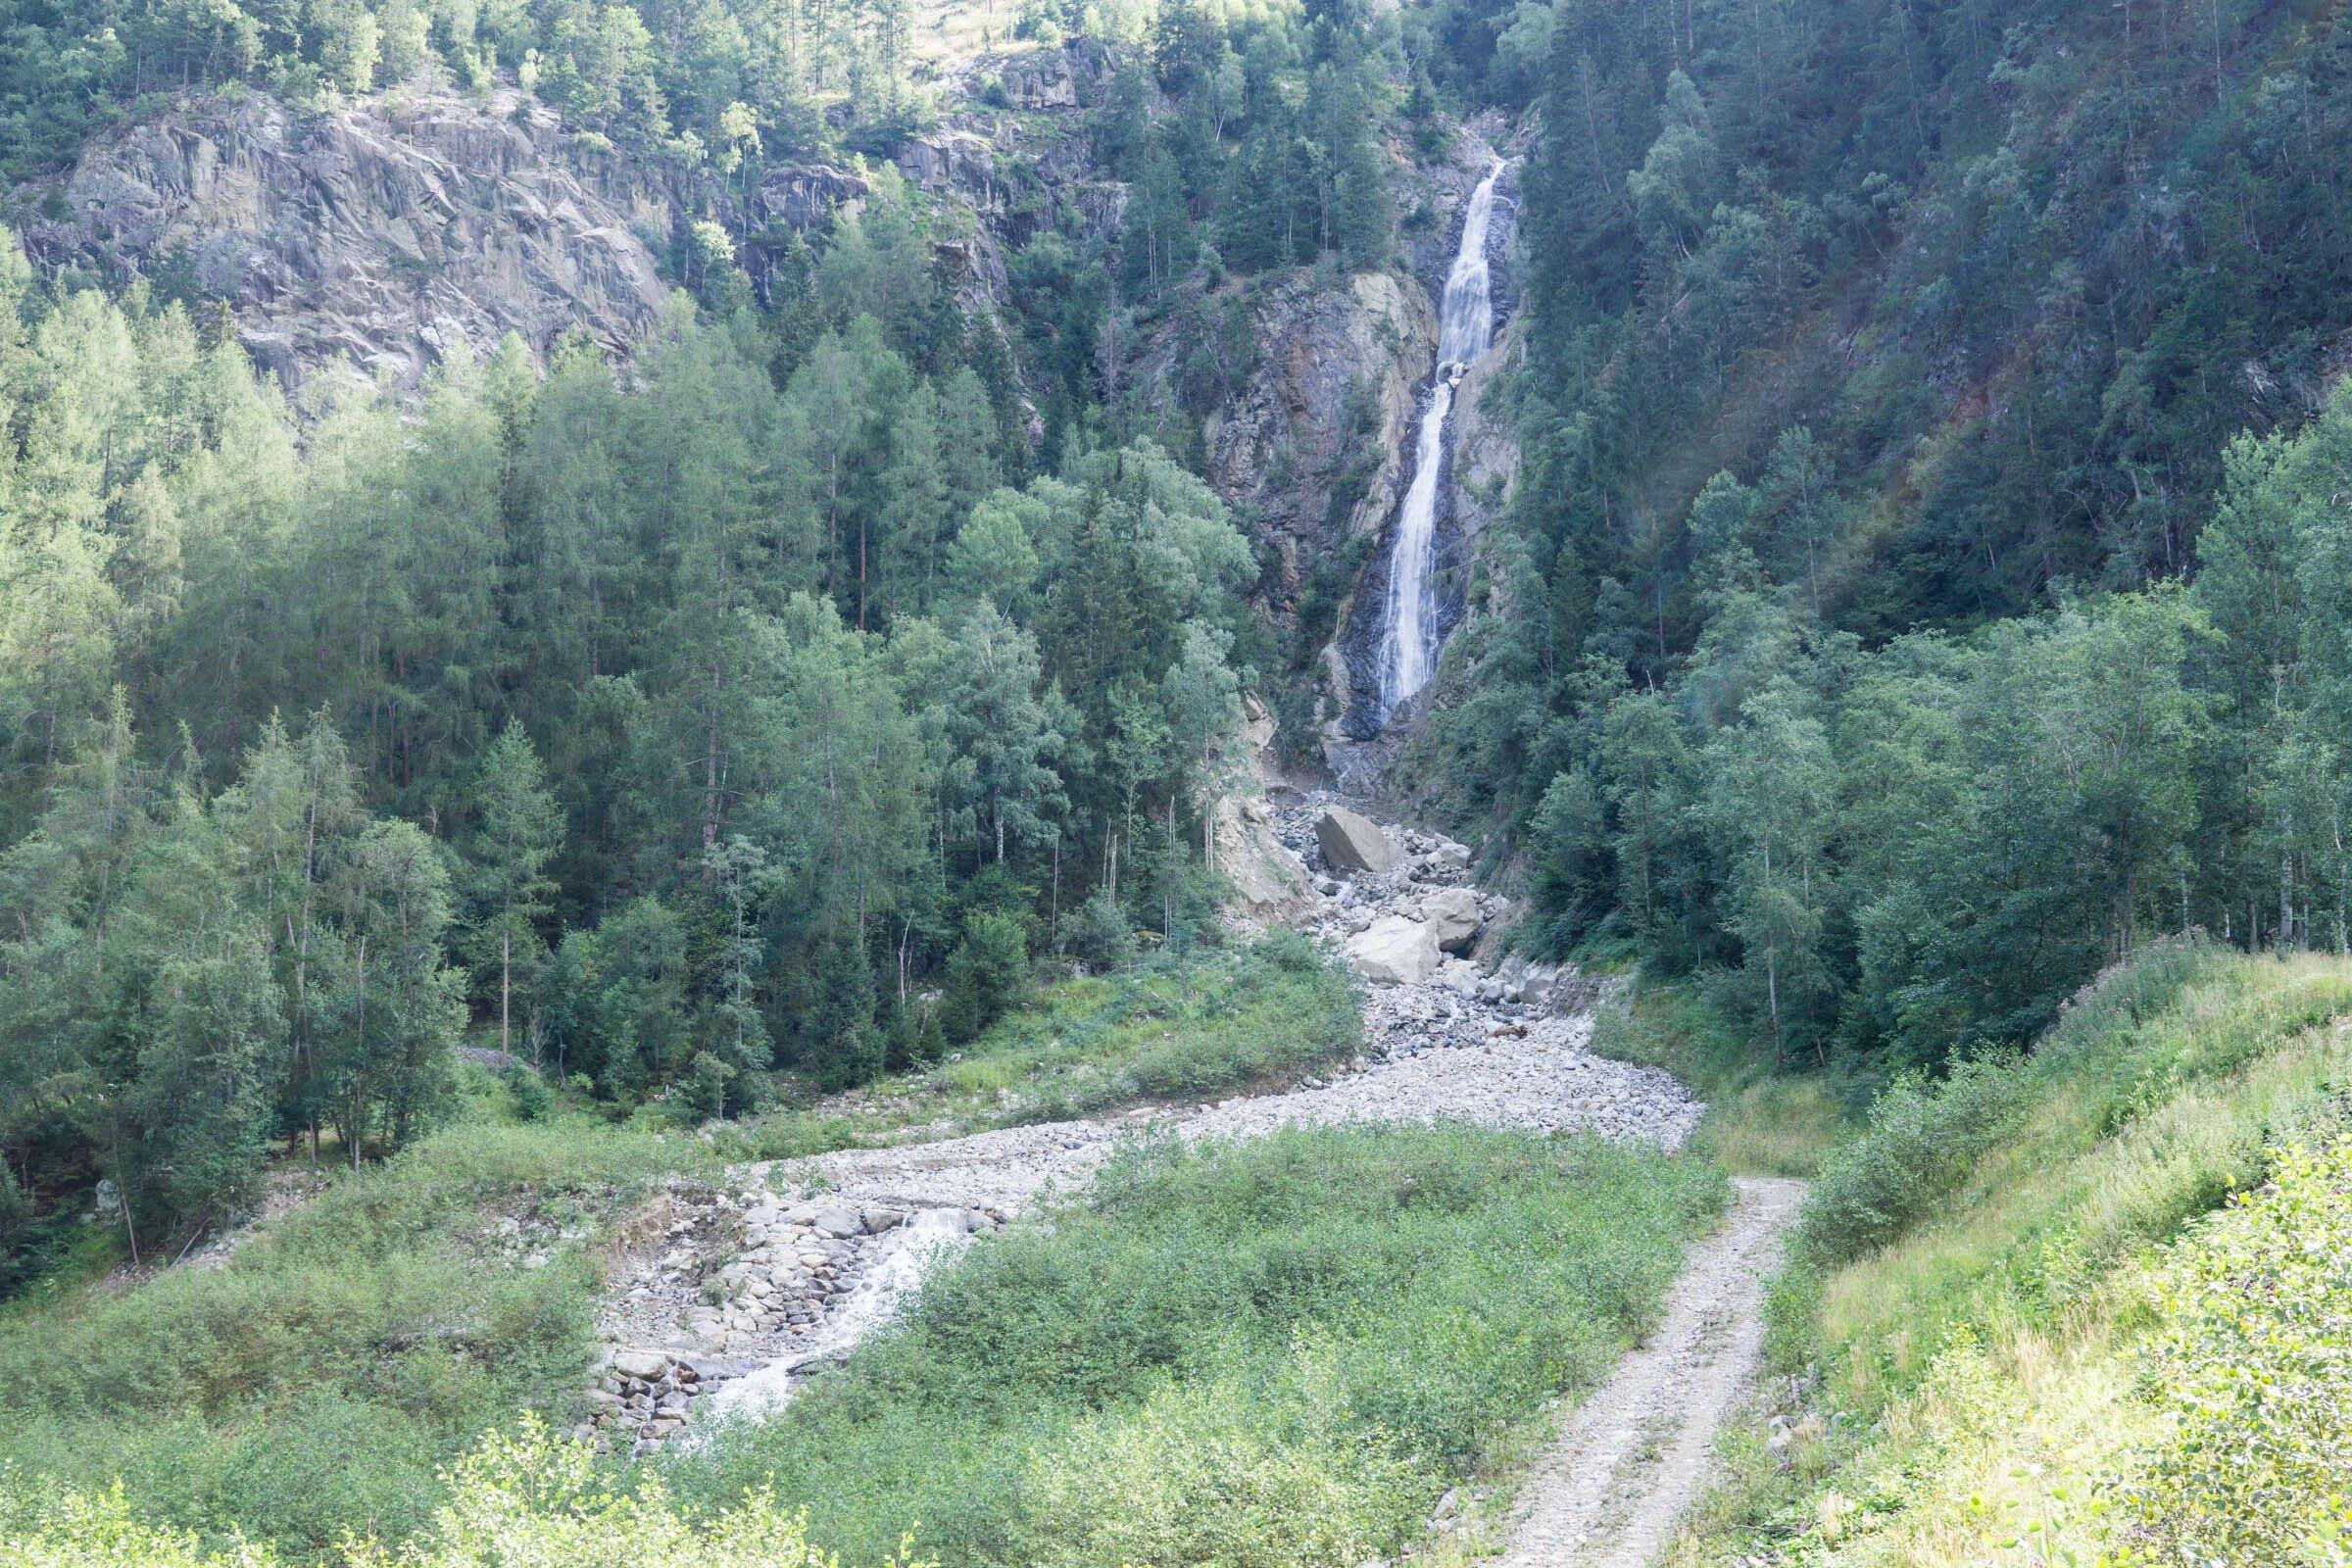 Felswand mit schmalem Wasserfall in Gebirgslandschaft